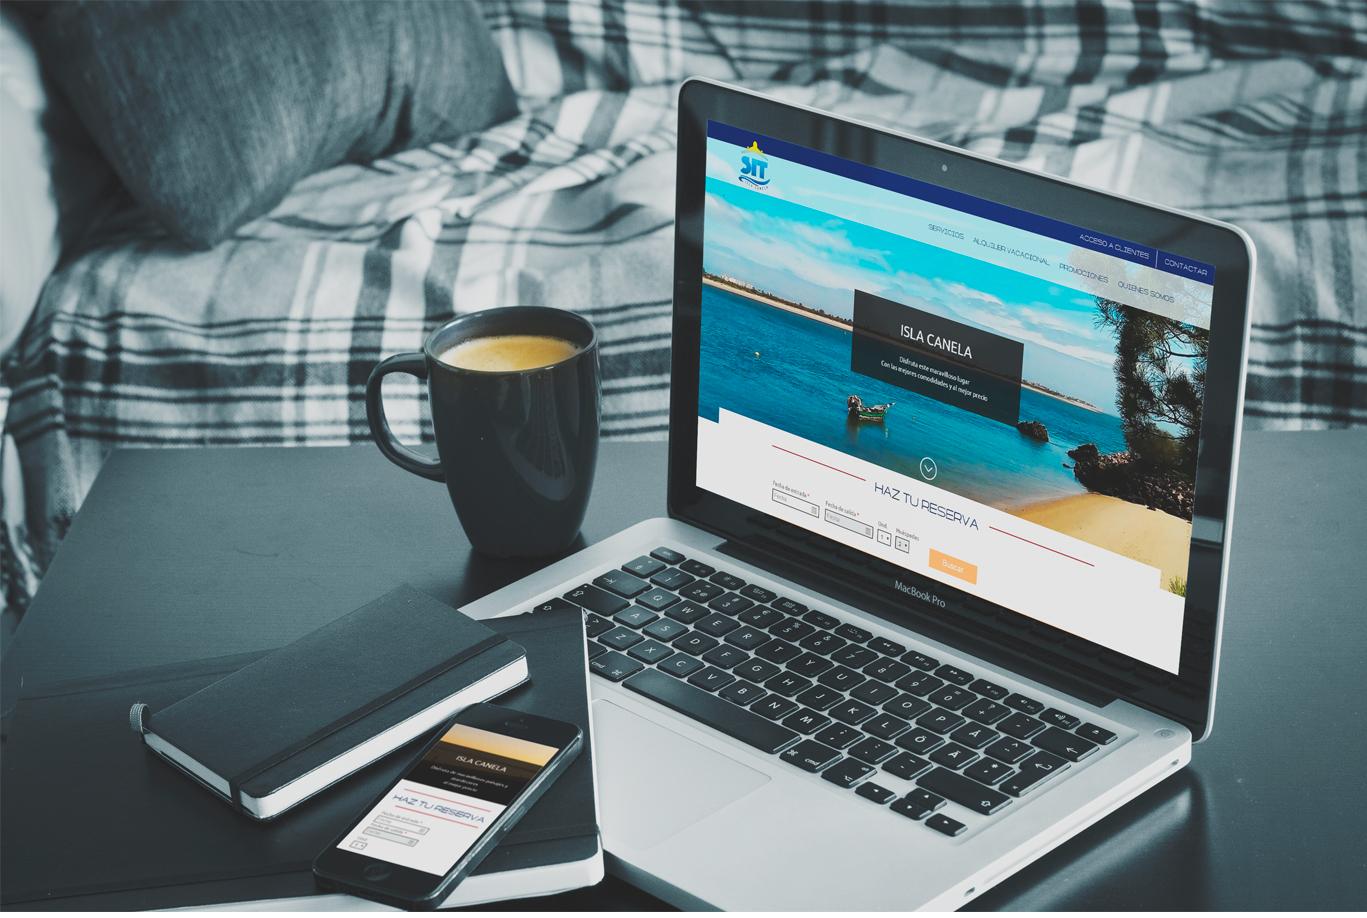 Diseño web, Diseño web Albacete, diseño y programación página web de Diseño web, Diseño web Albacete, diseño y programación página web de SIT Isla Canela